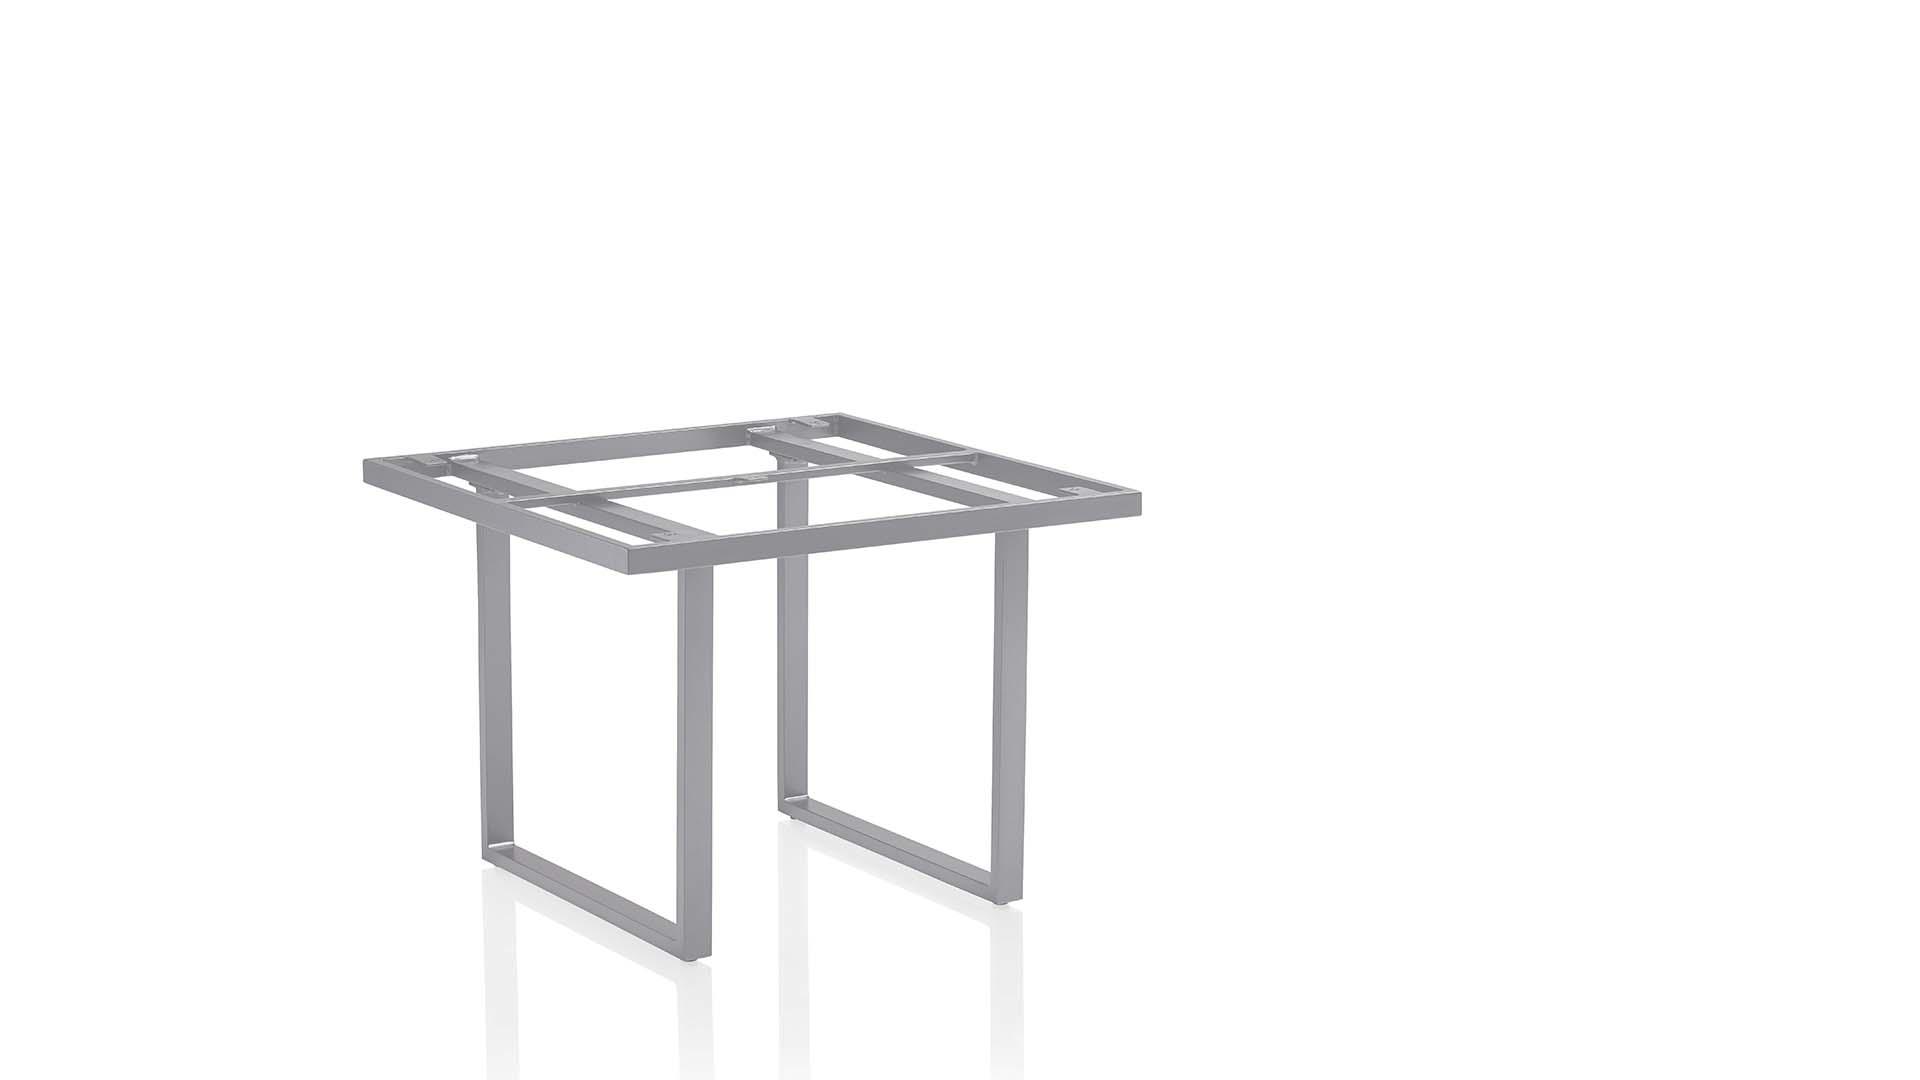 SKATE Casual Dining Tischgestell 95 x 95 cm